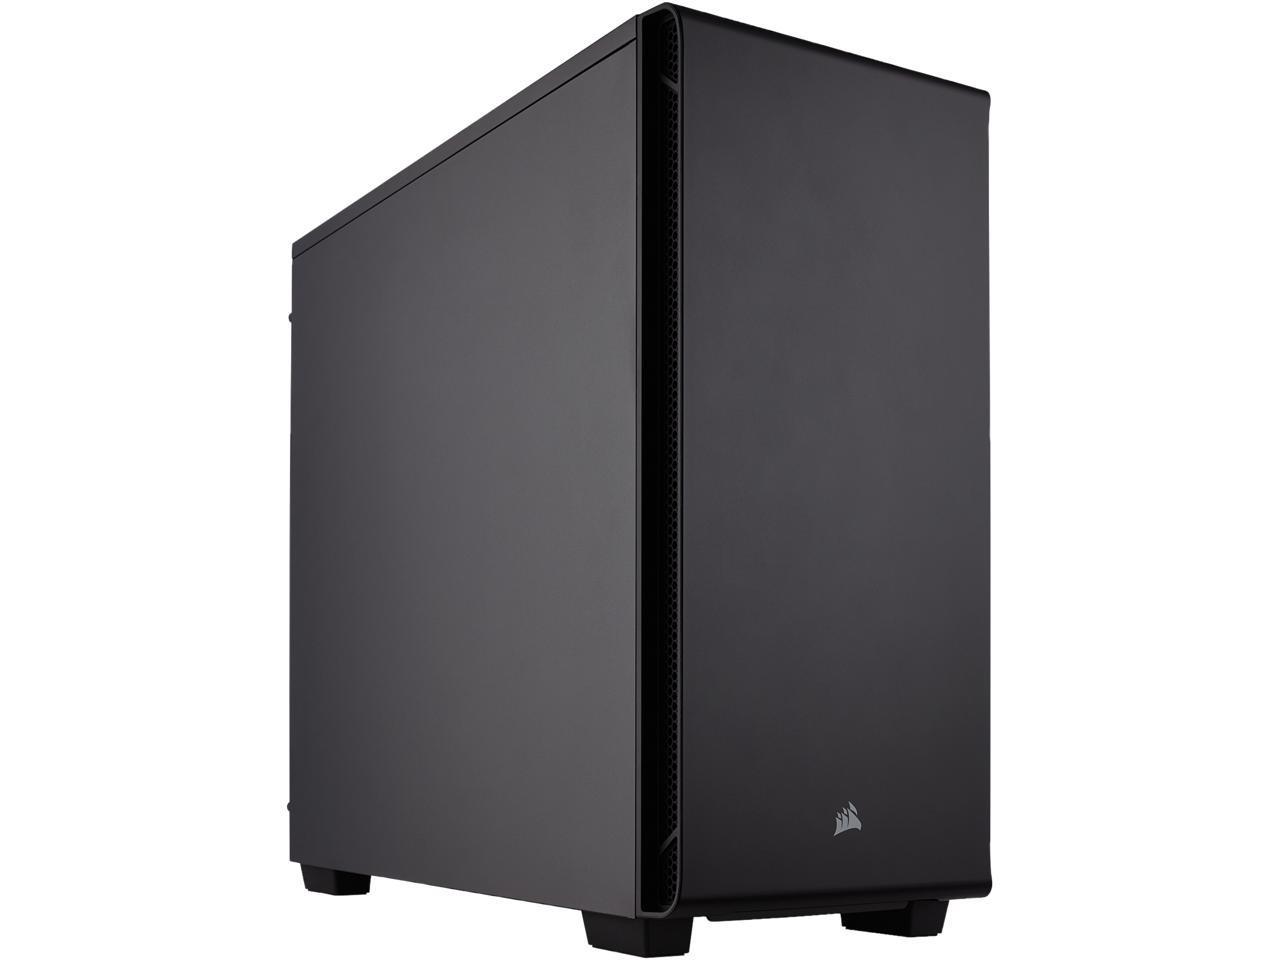 Corsair Carbide Series 270R Black Steel ATX Mid Tower Computer Case